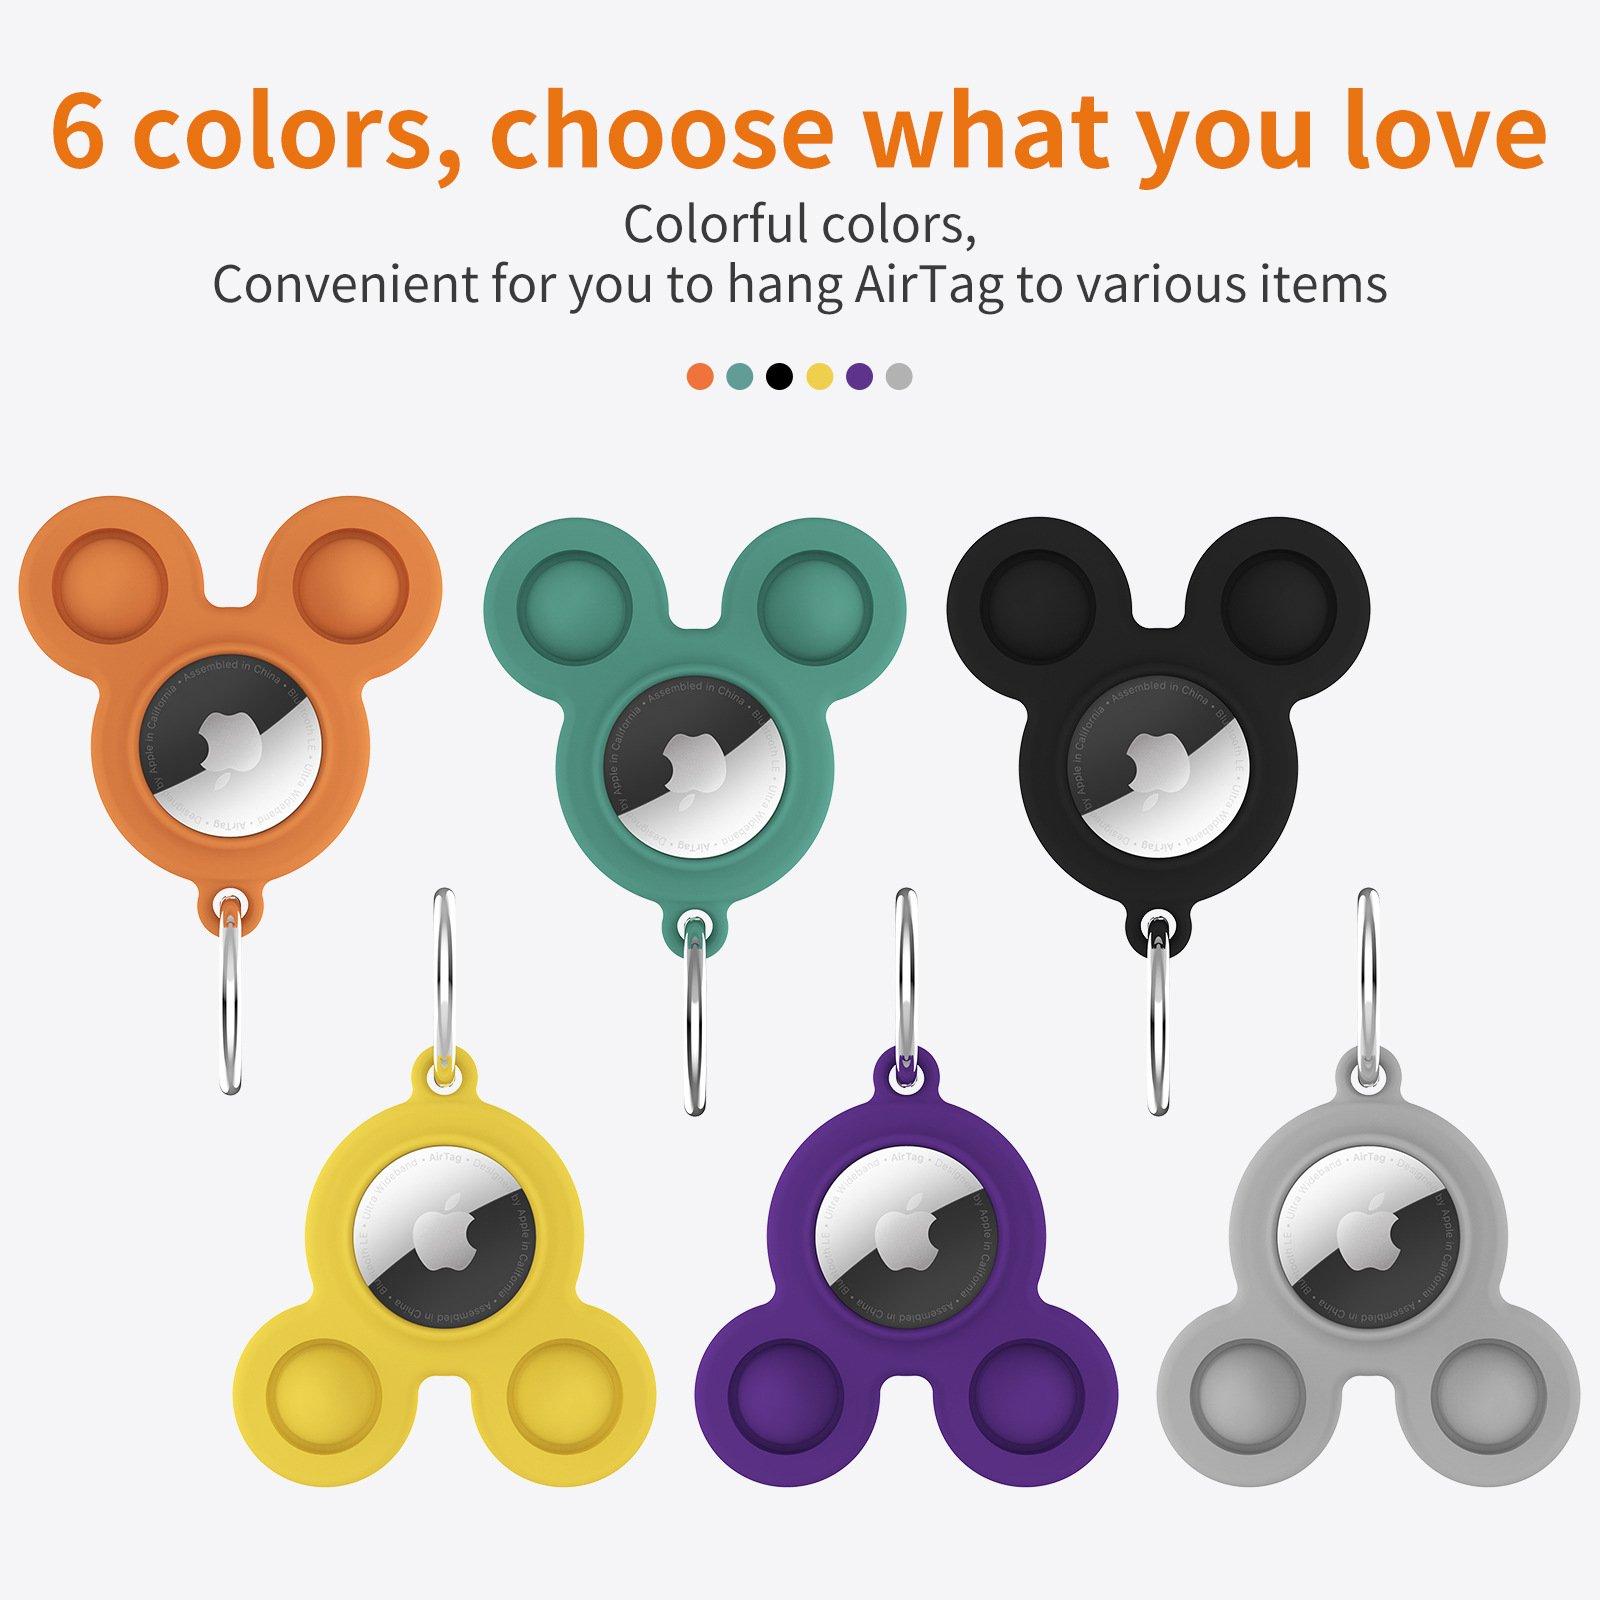 LOVINGCASE bulk wholesale silicone airtag case key ring-6 solid colors